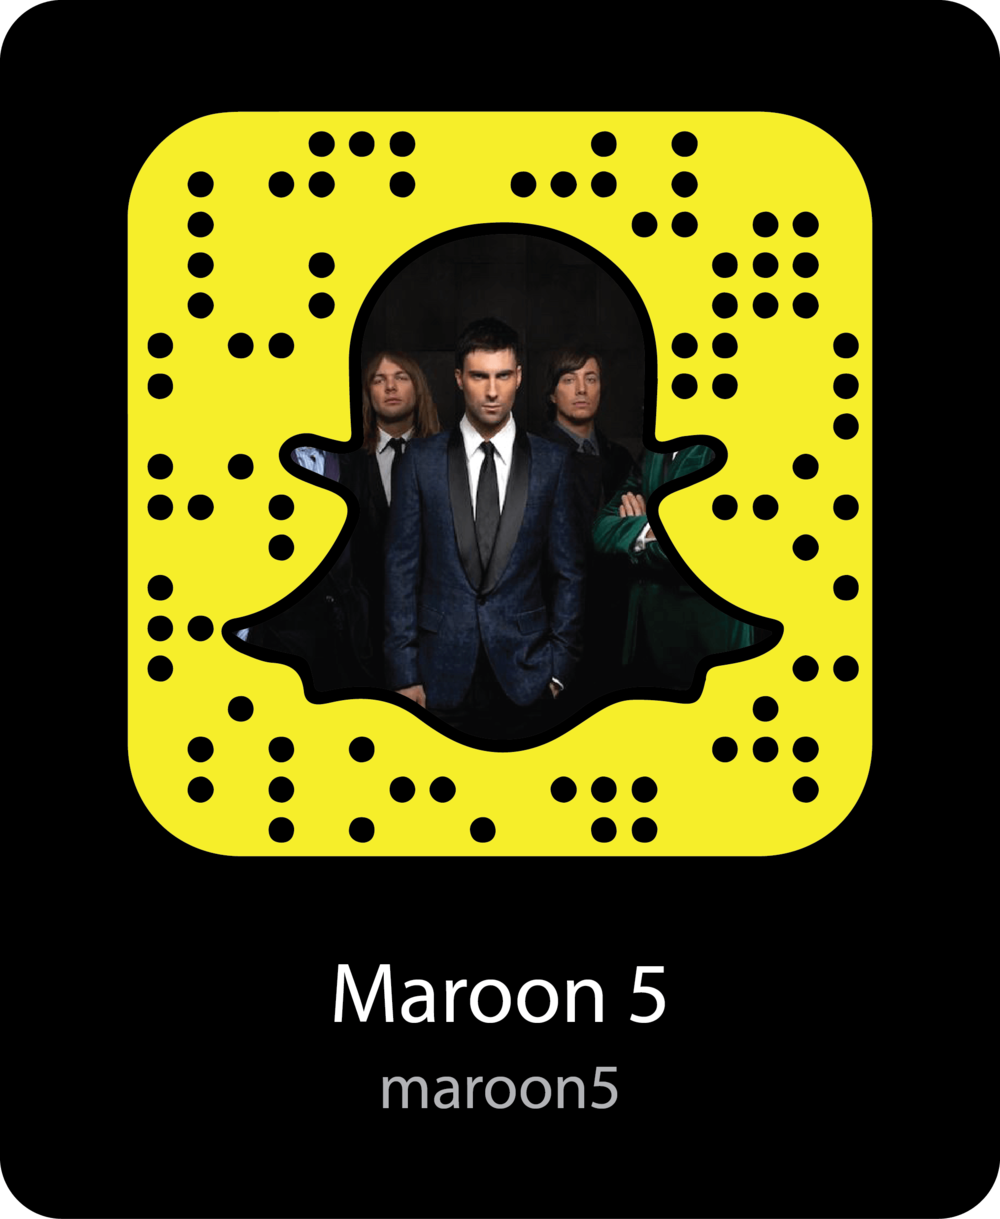 maroon-5-celebrity-snapchat-snapcode